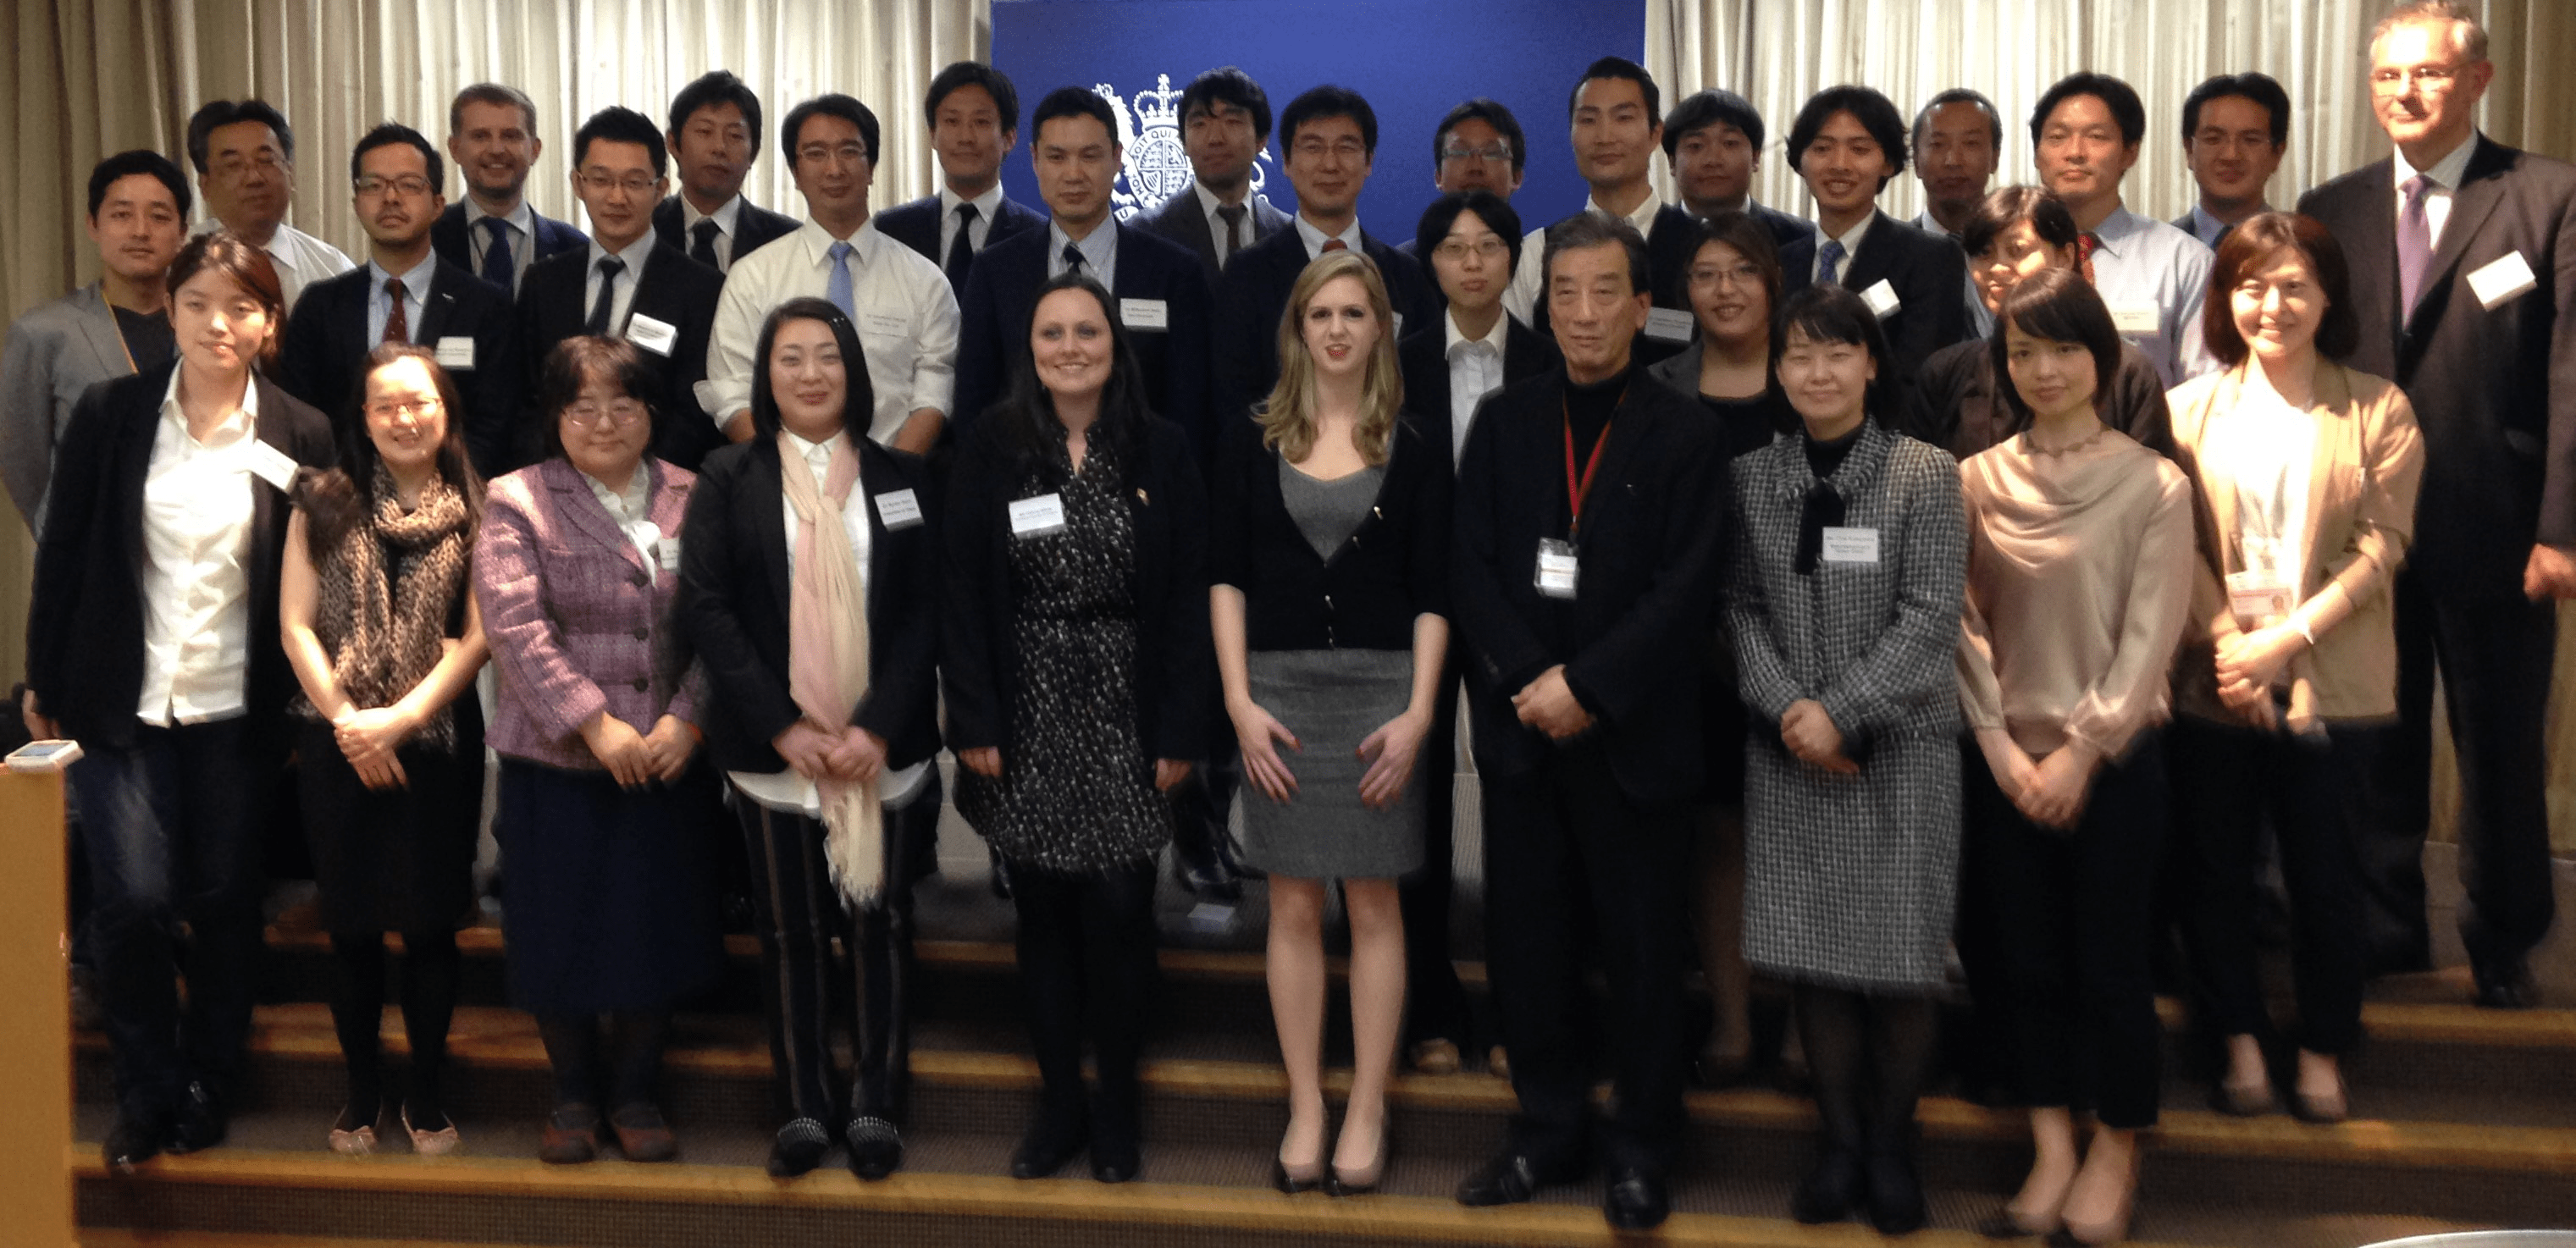 Japanese young leaders meeting, Tokyo, November 2014